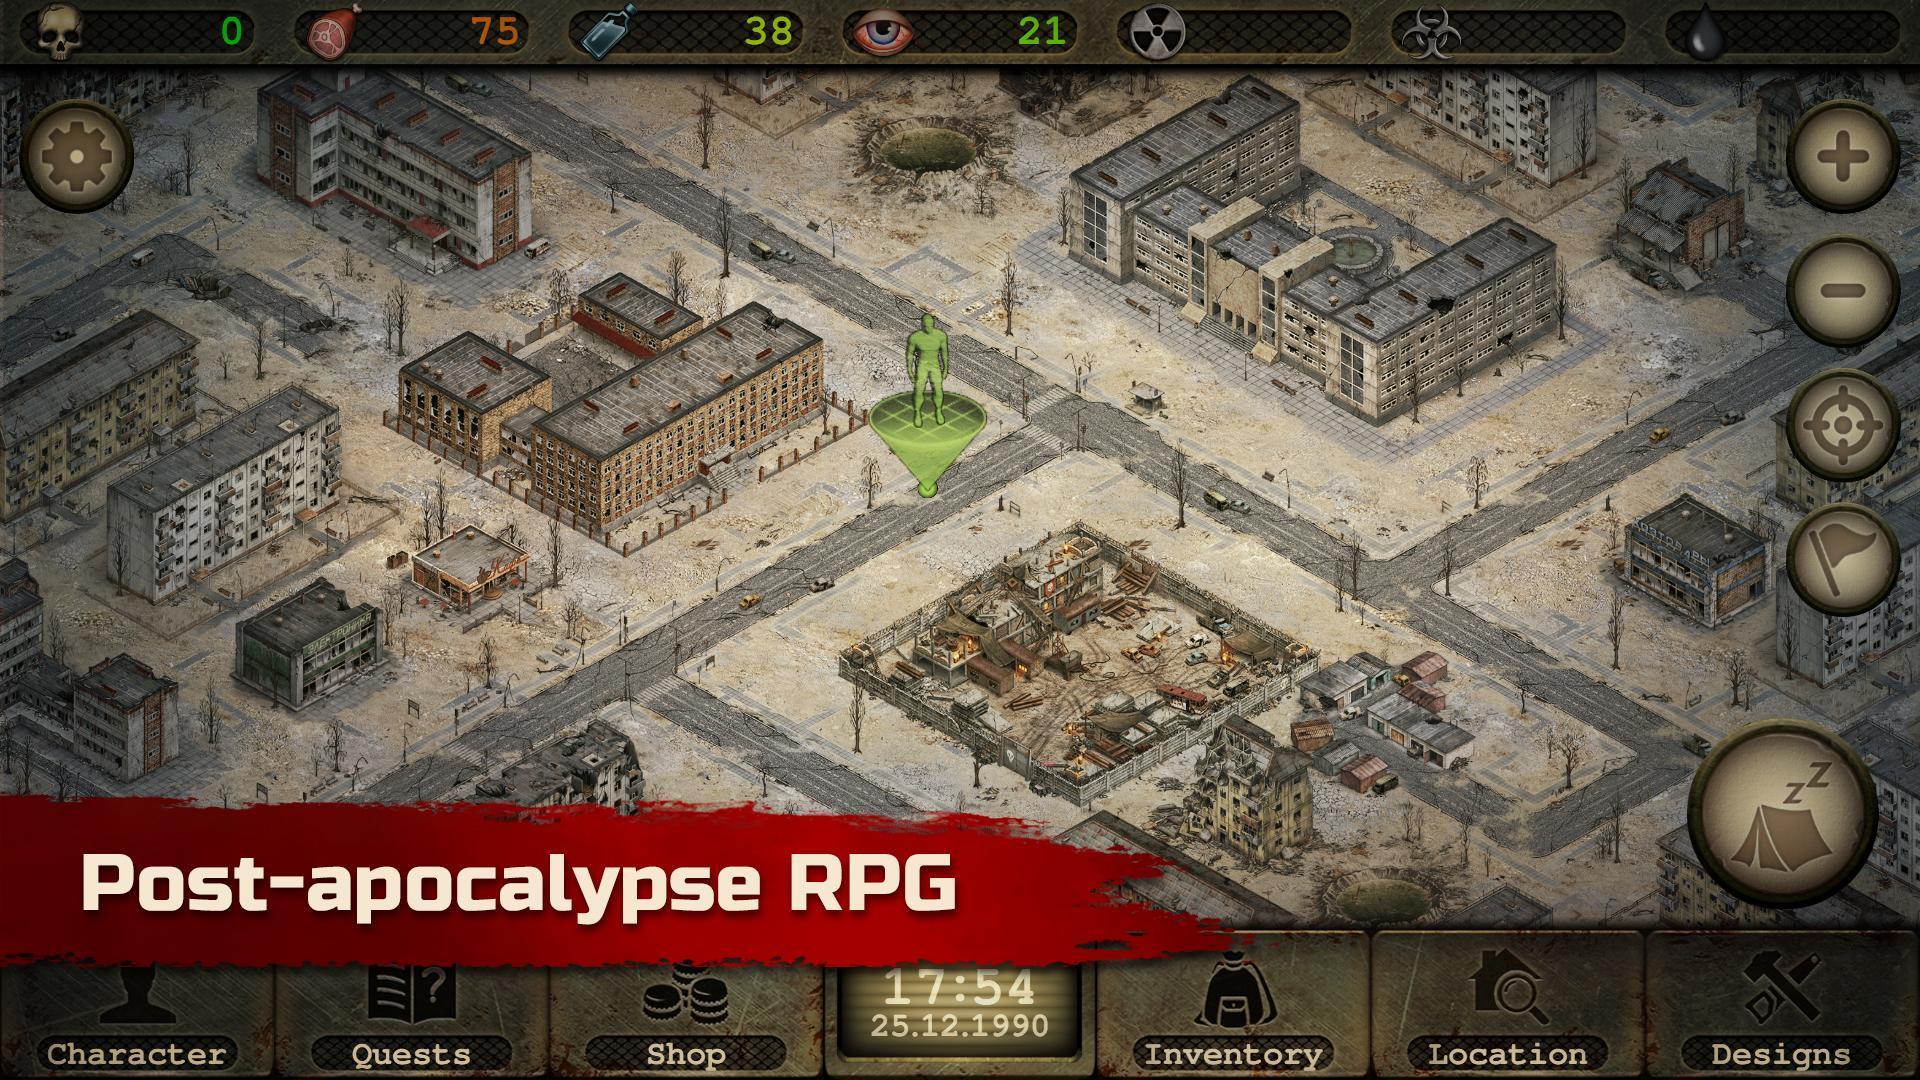 Day R Survival – Apocalypse, Lone Survivor and RPG 1.647 Screenshot 13